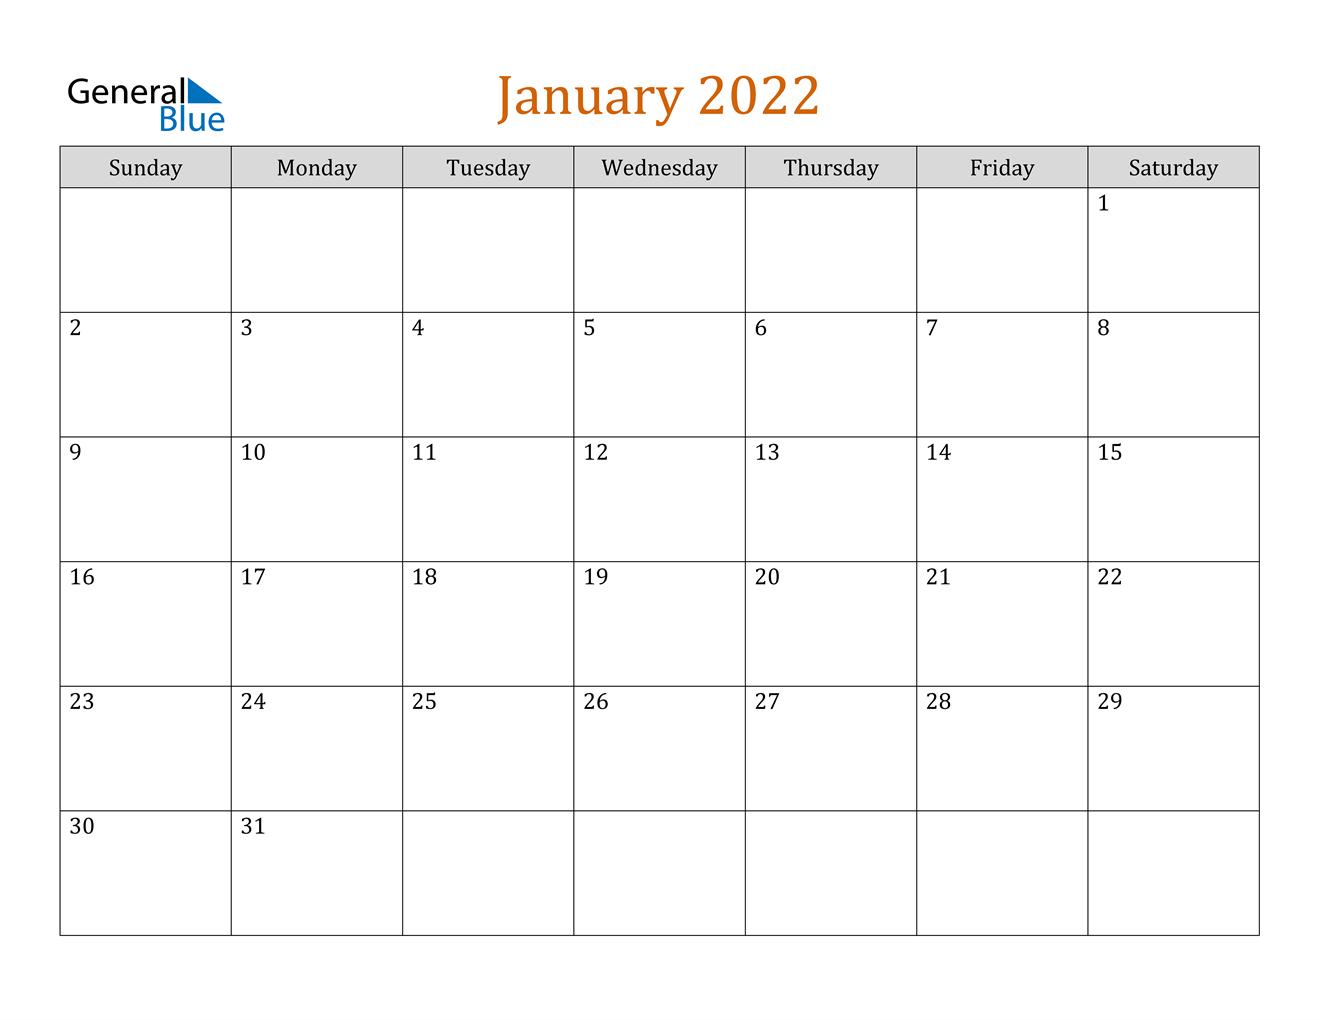 January 2022 Calendar (Pdf Word Excel) intended for Printable Calendar January 2022 Floral